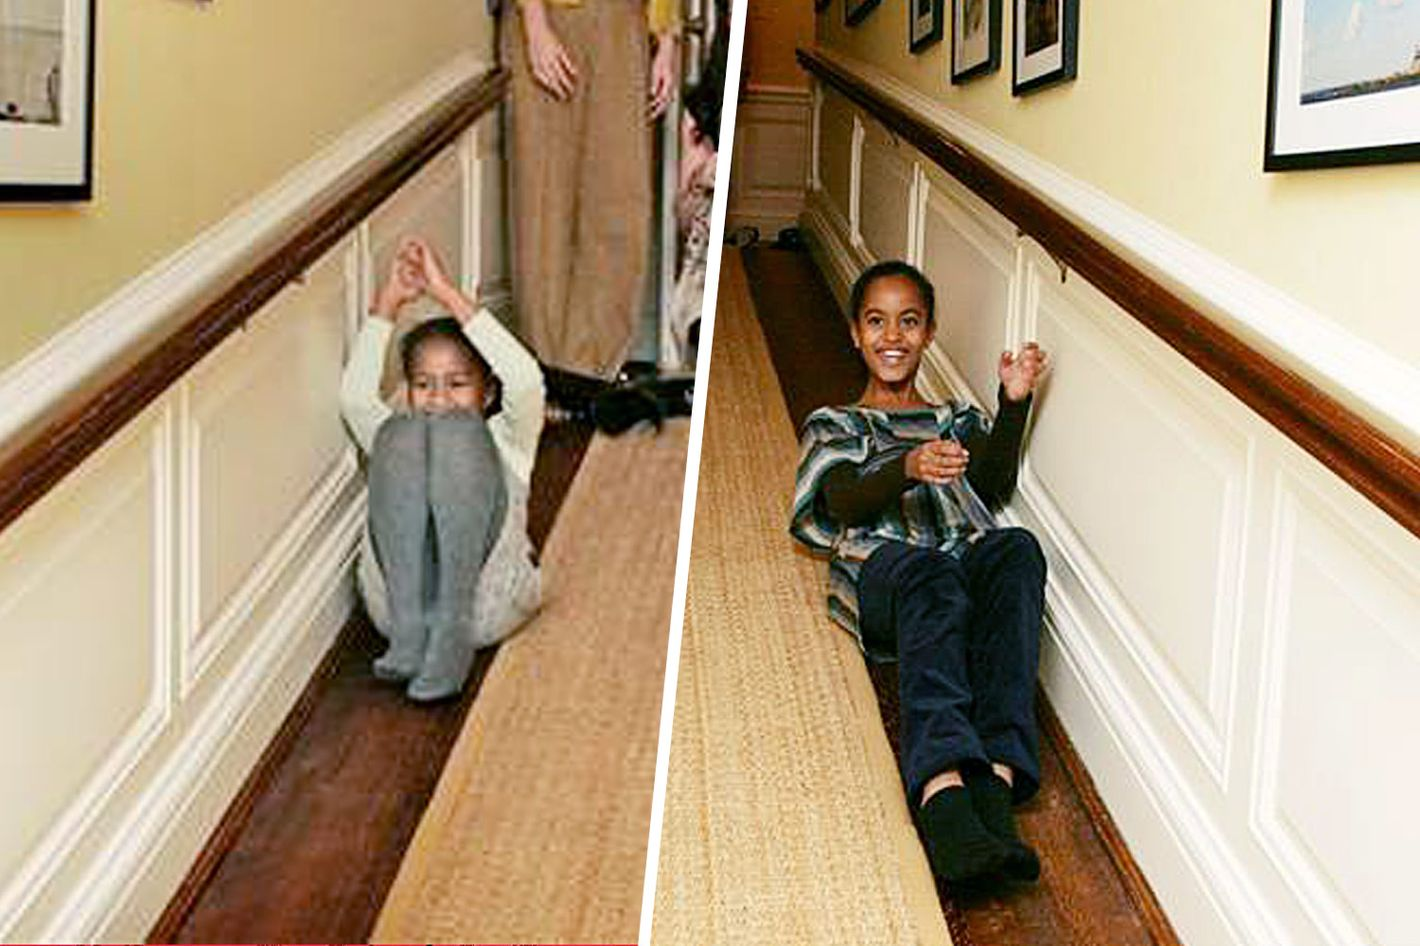 adorable photos of malia and sasha's first white house visit